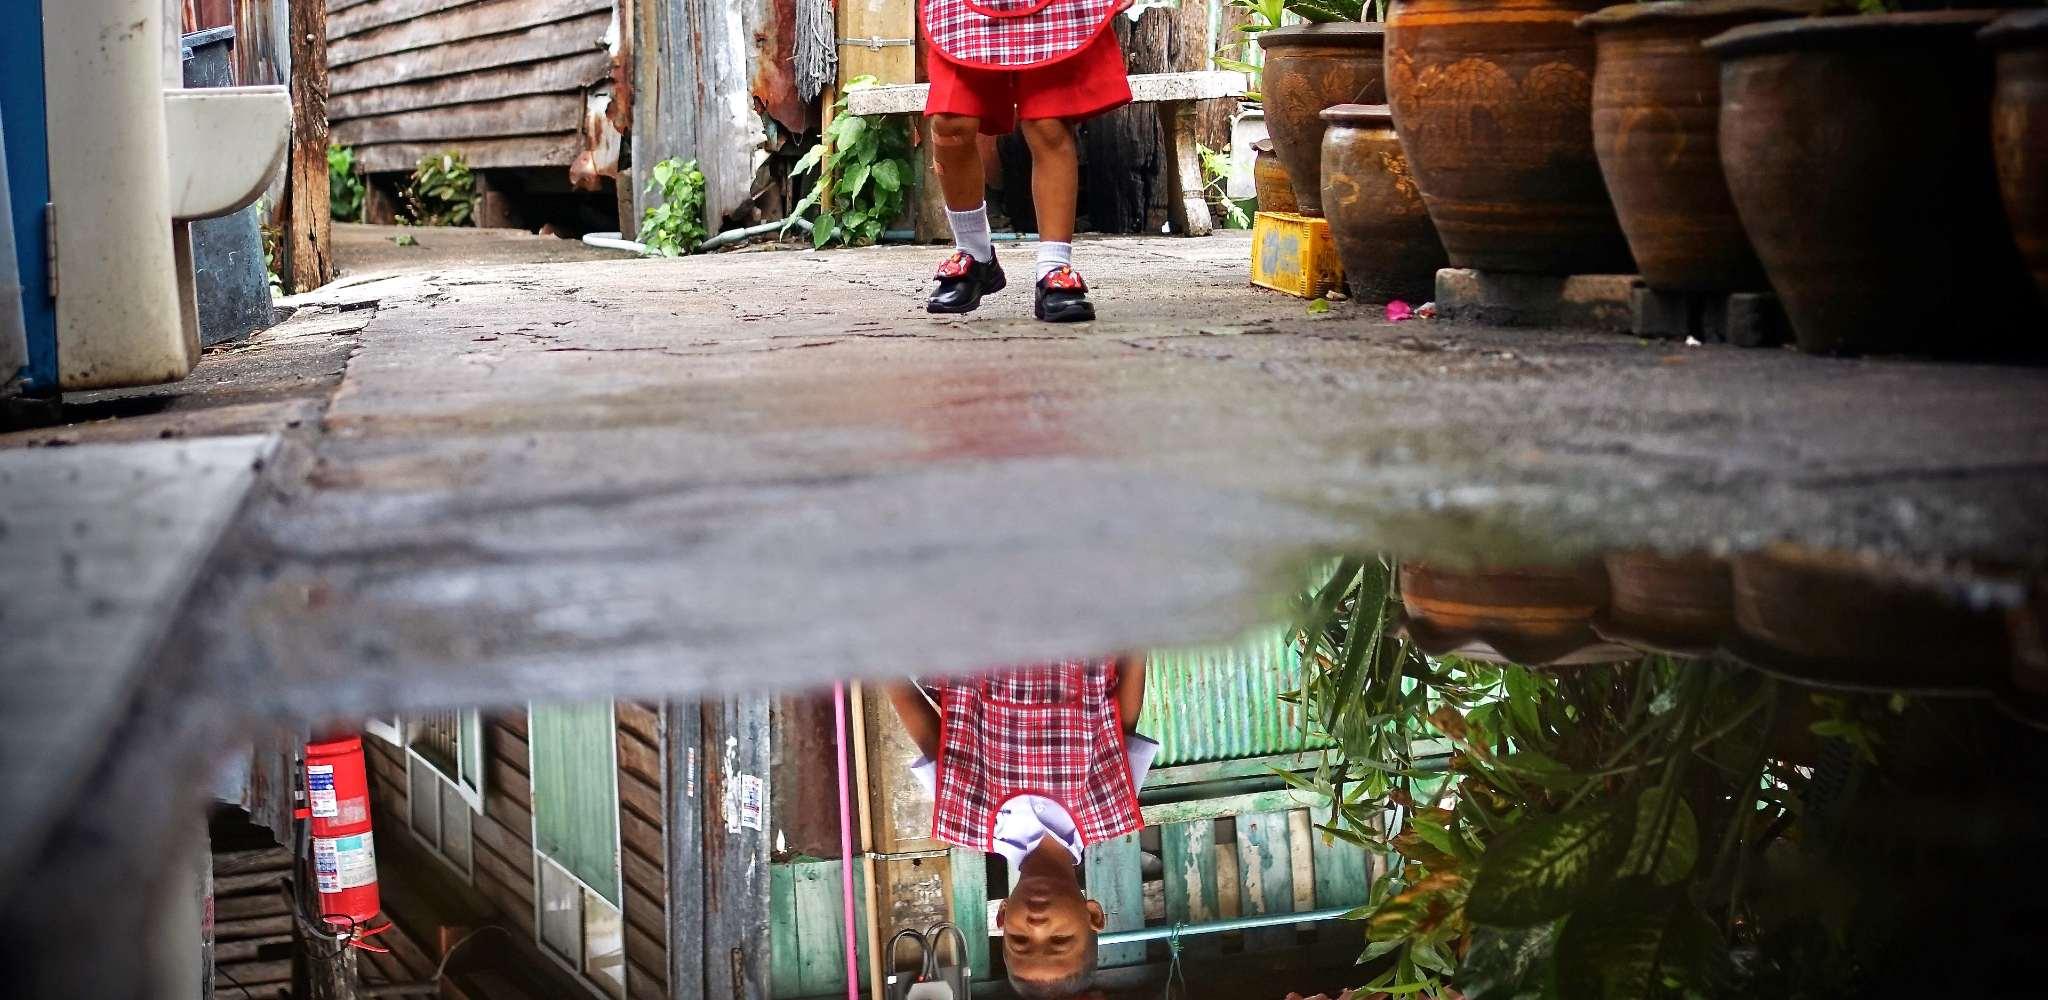 young child at Wat Sawetachat temple in Bangkok, Thailand